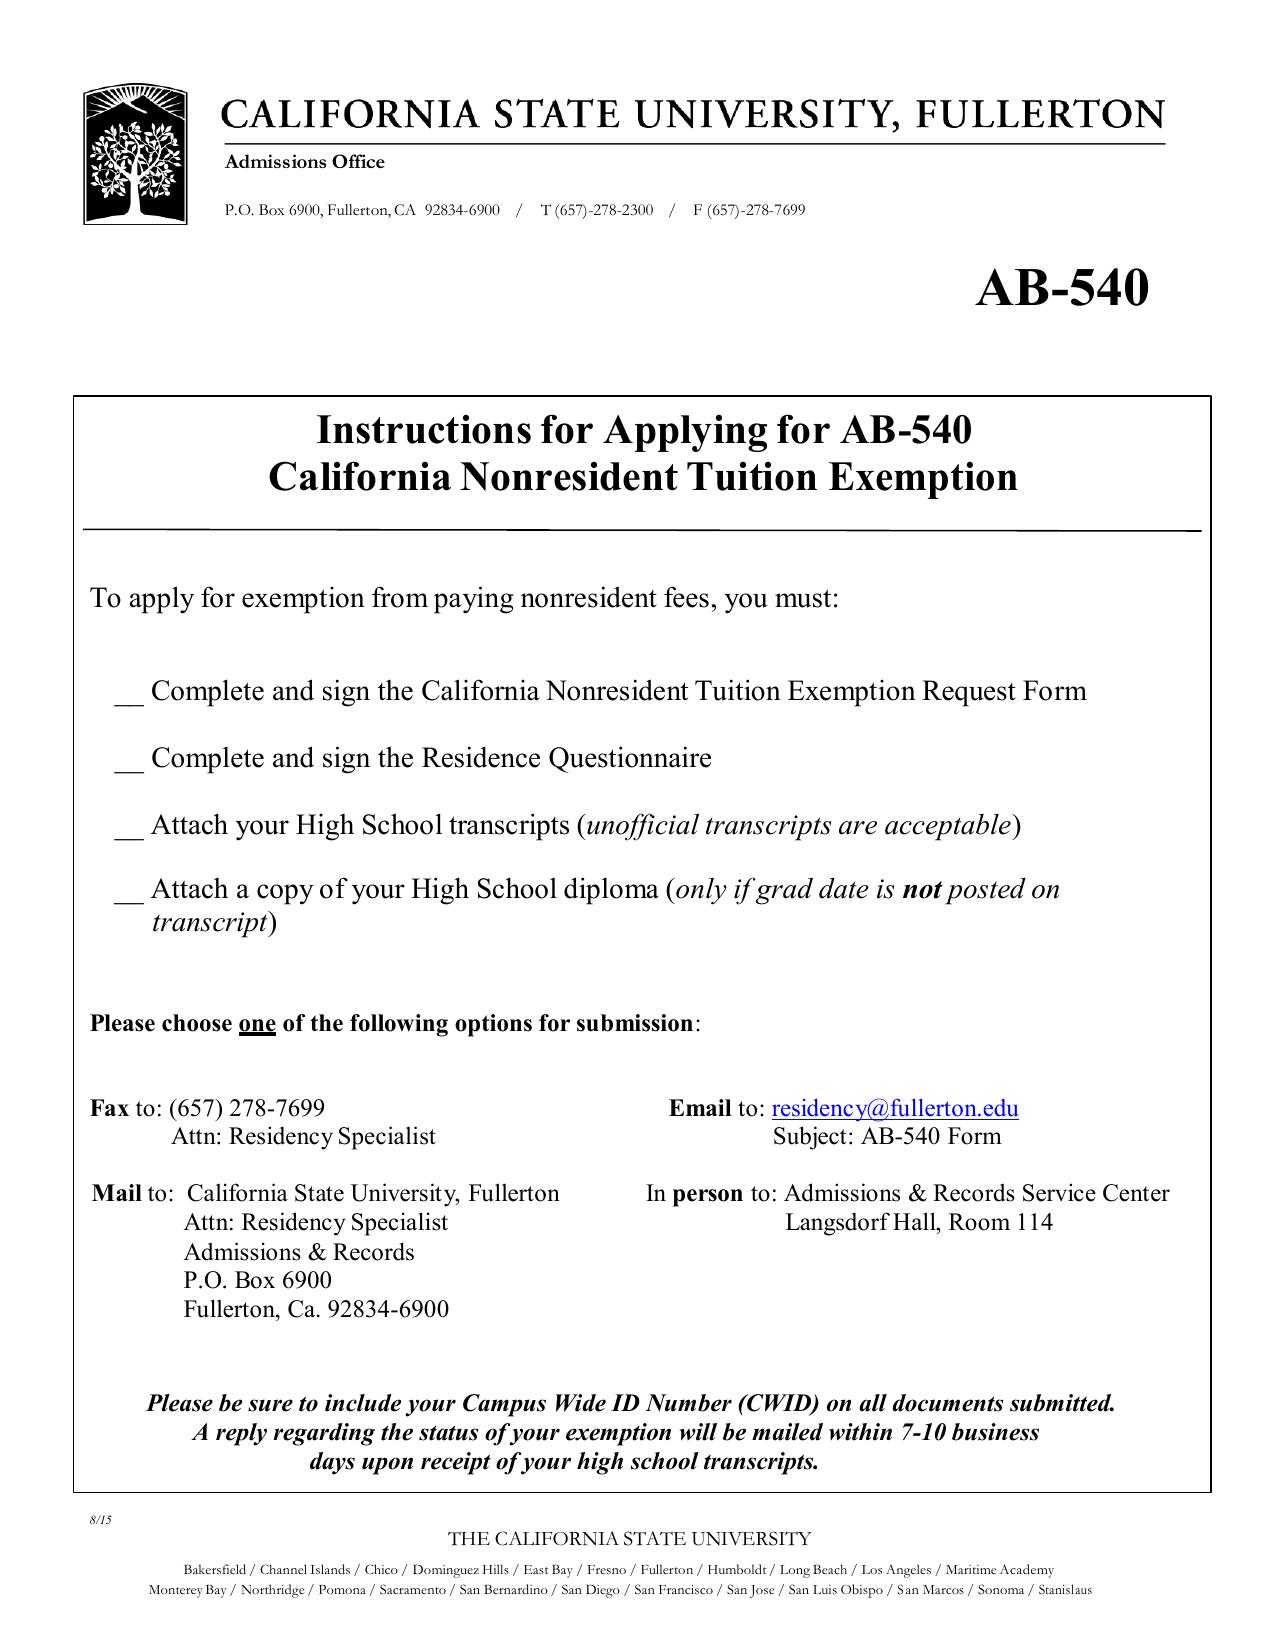 AB-540 - California State University, Fullerton